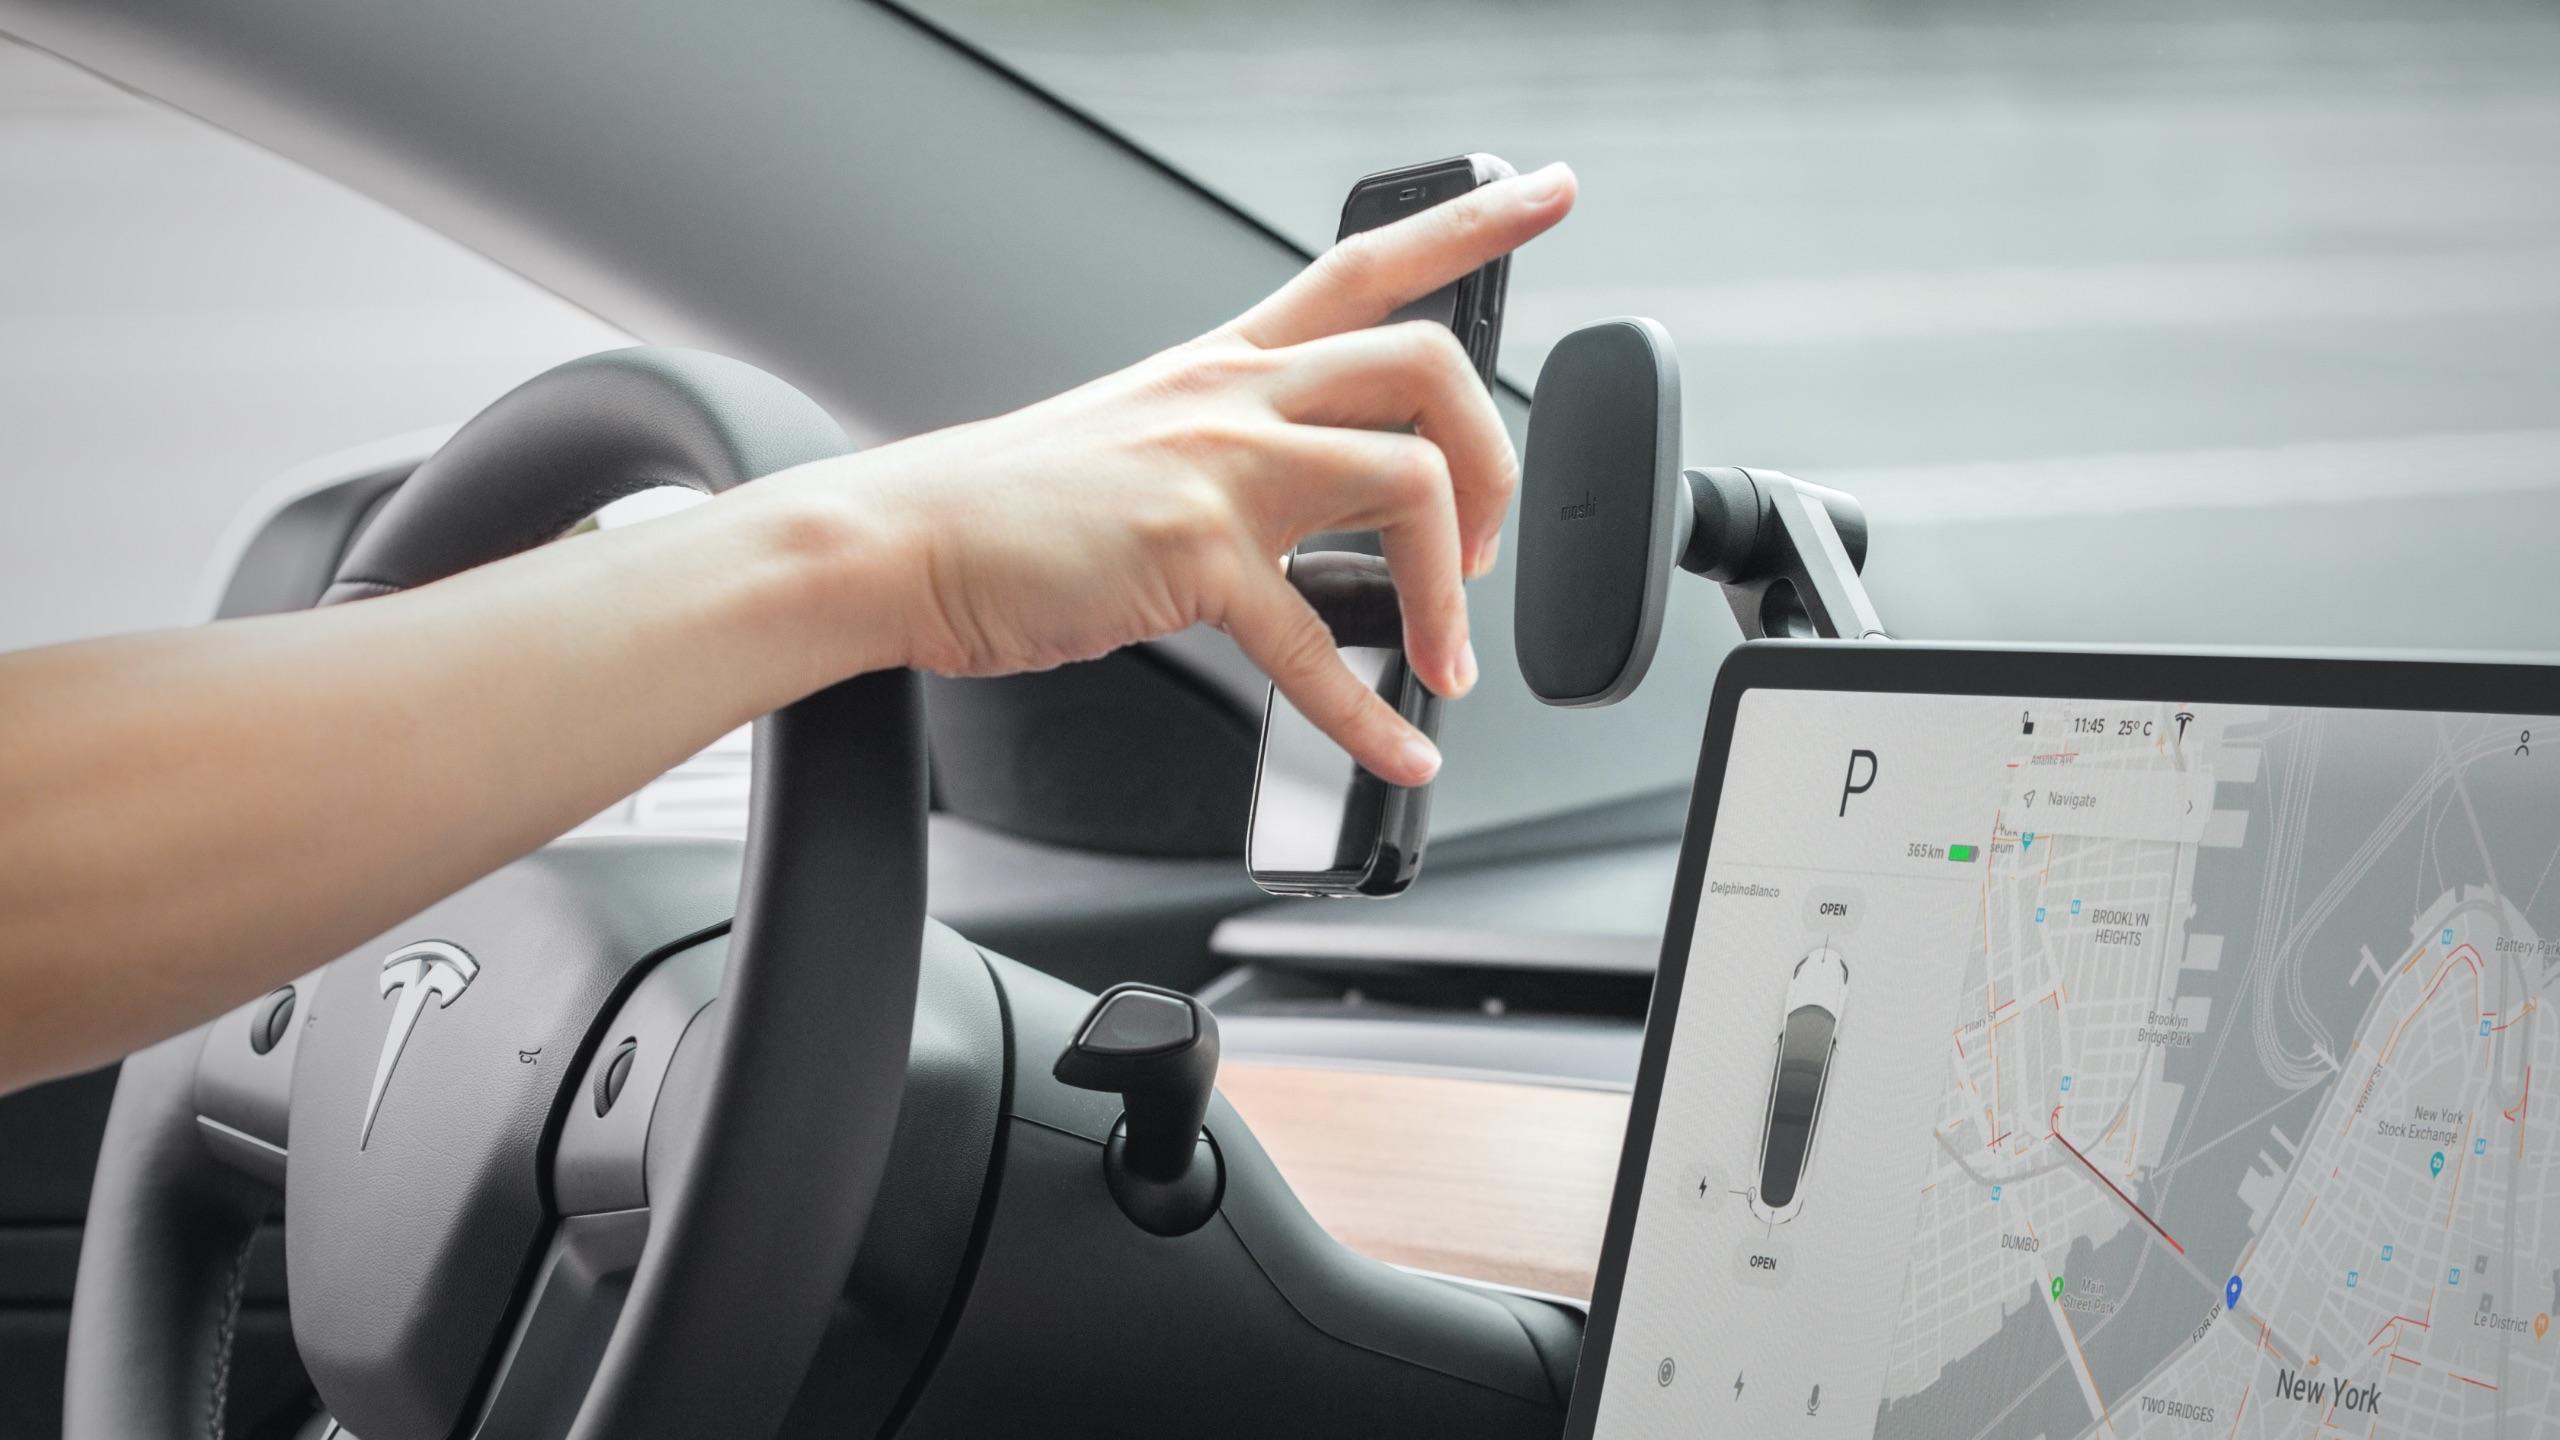 SnapTo Universal Car Mount-image